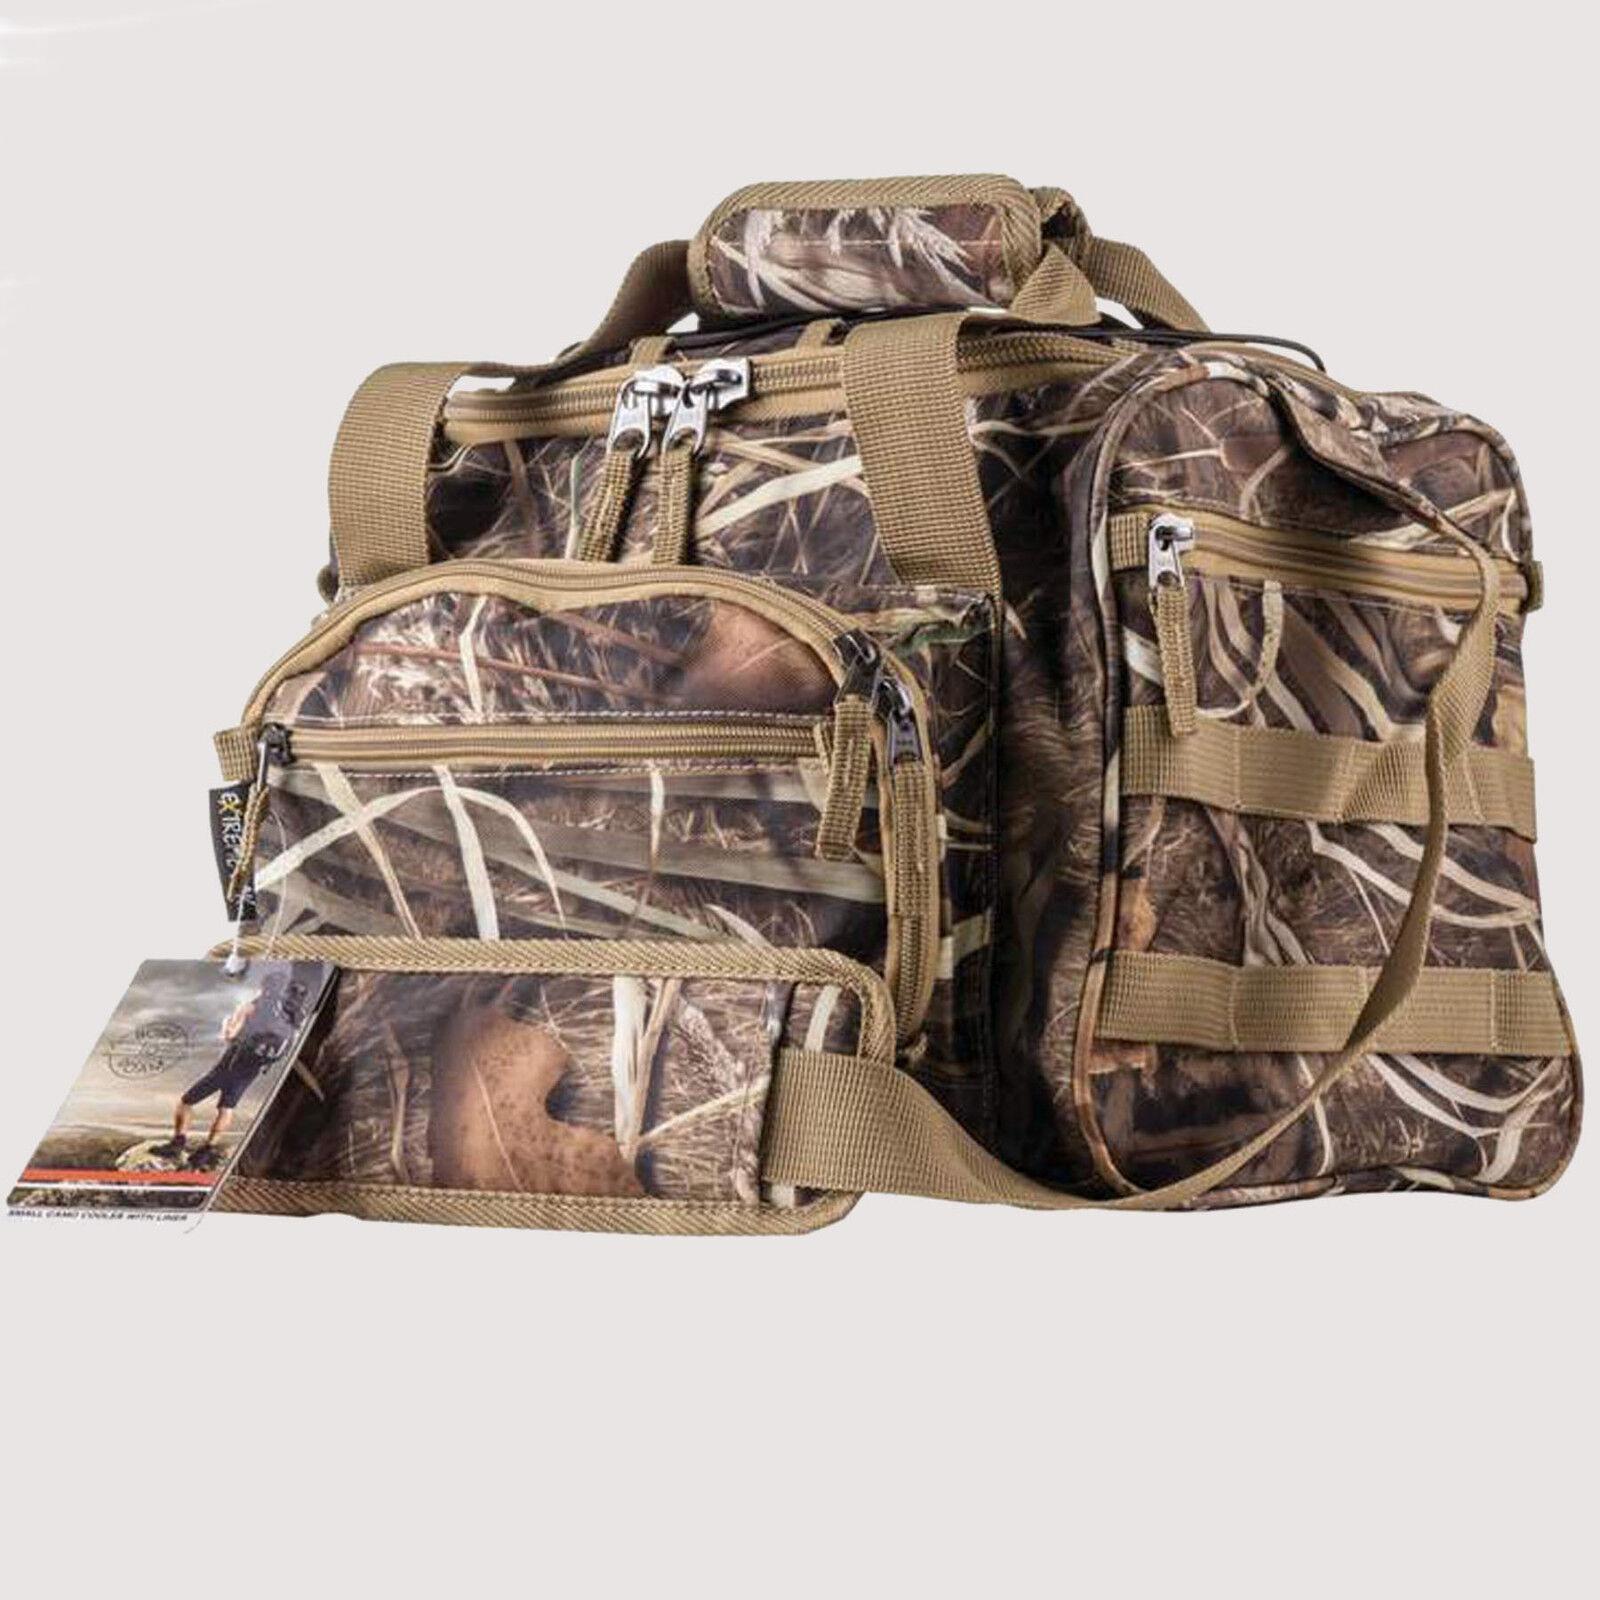 "Small Waterproof 13"" Swamper Camo Cooler Bag Lunch Box Work"